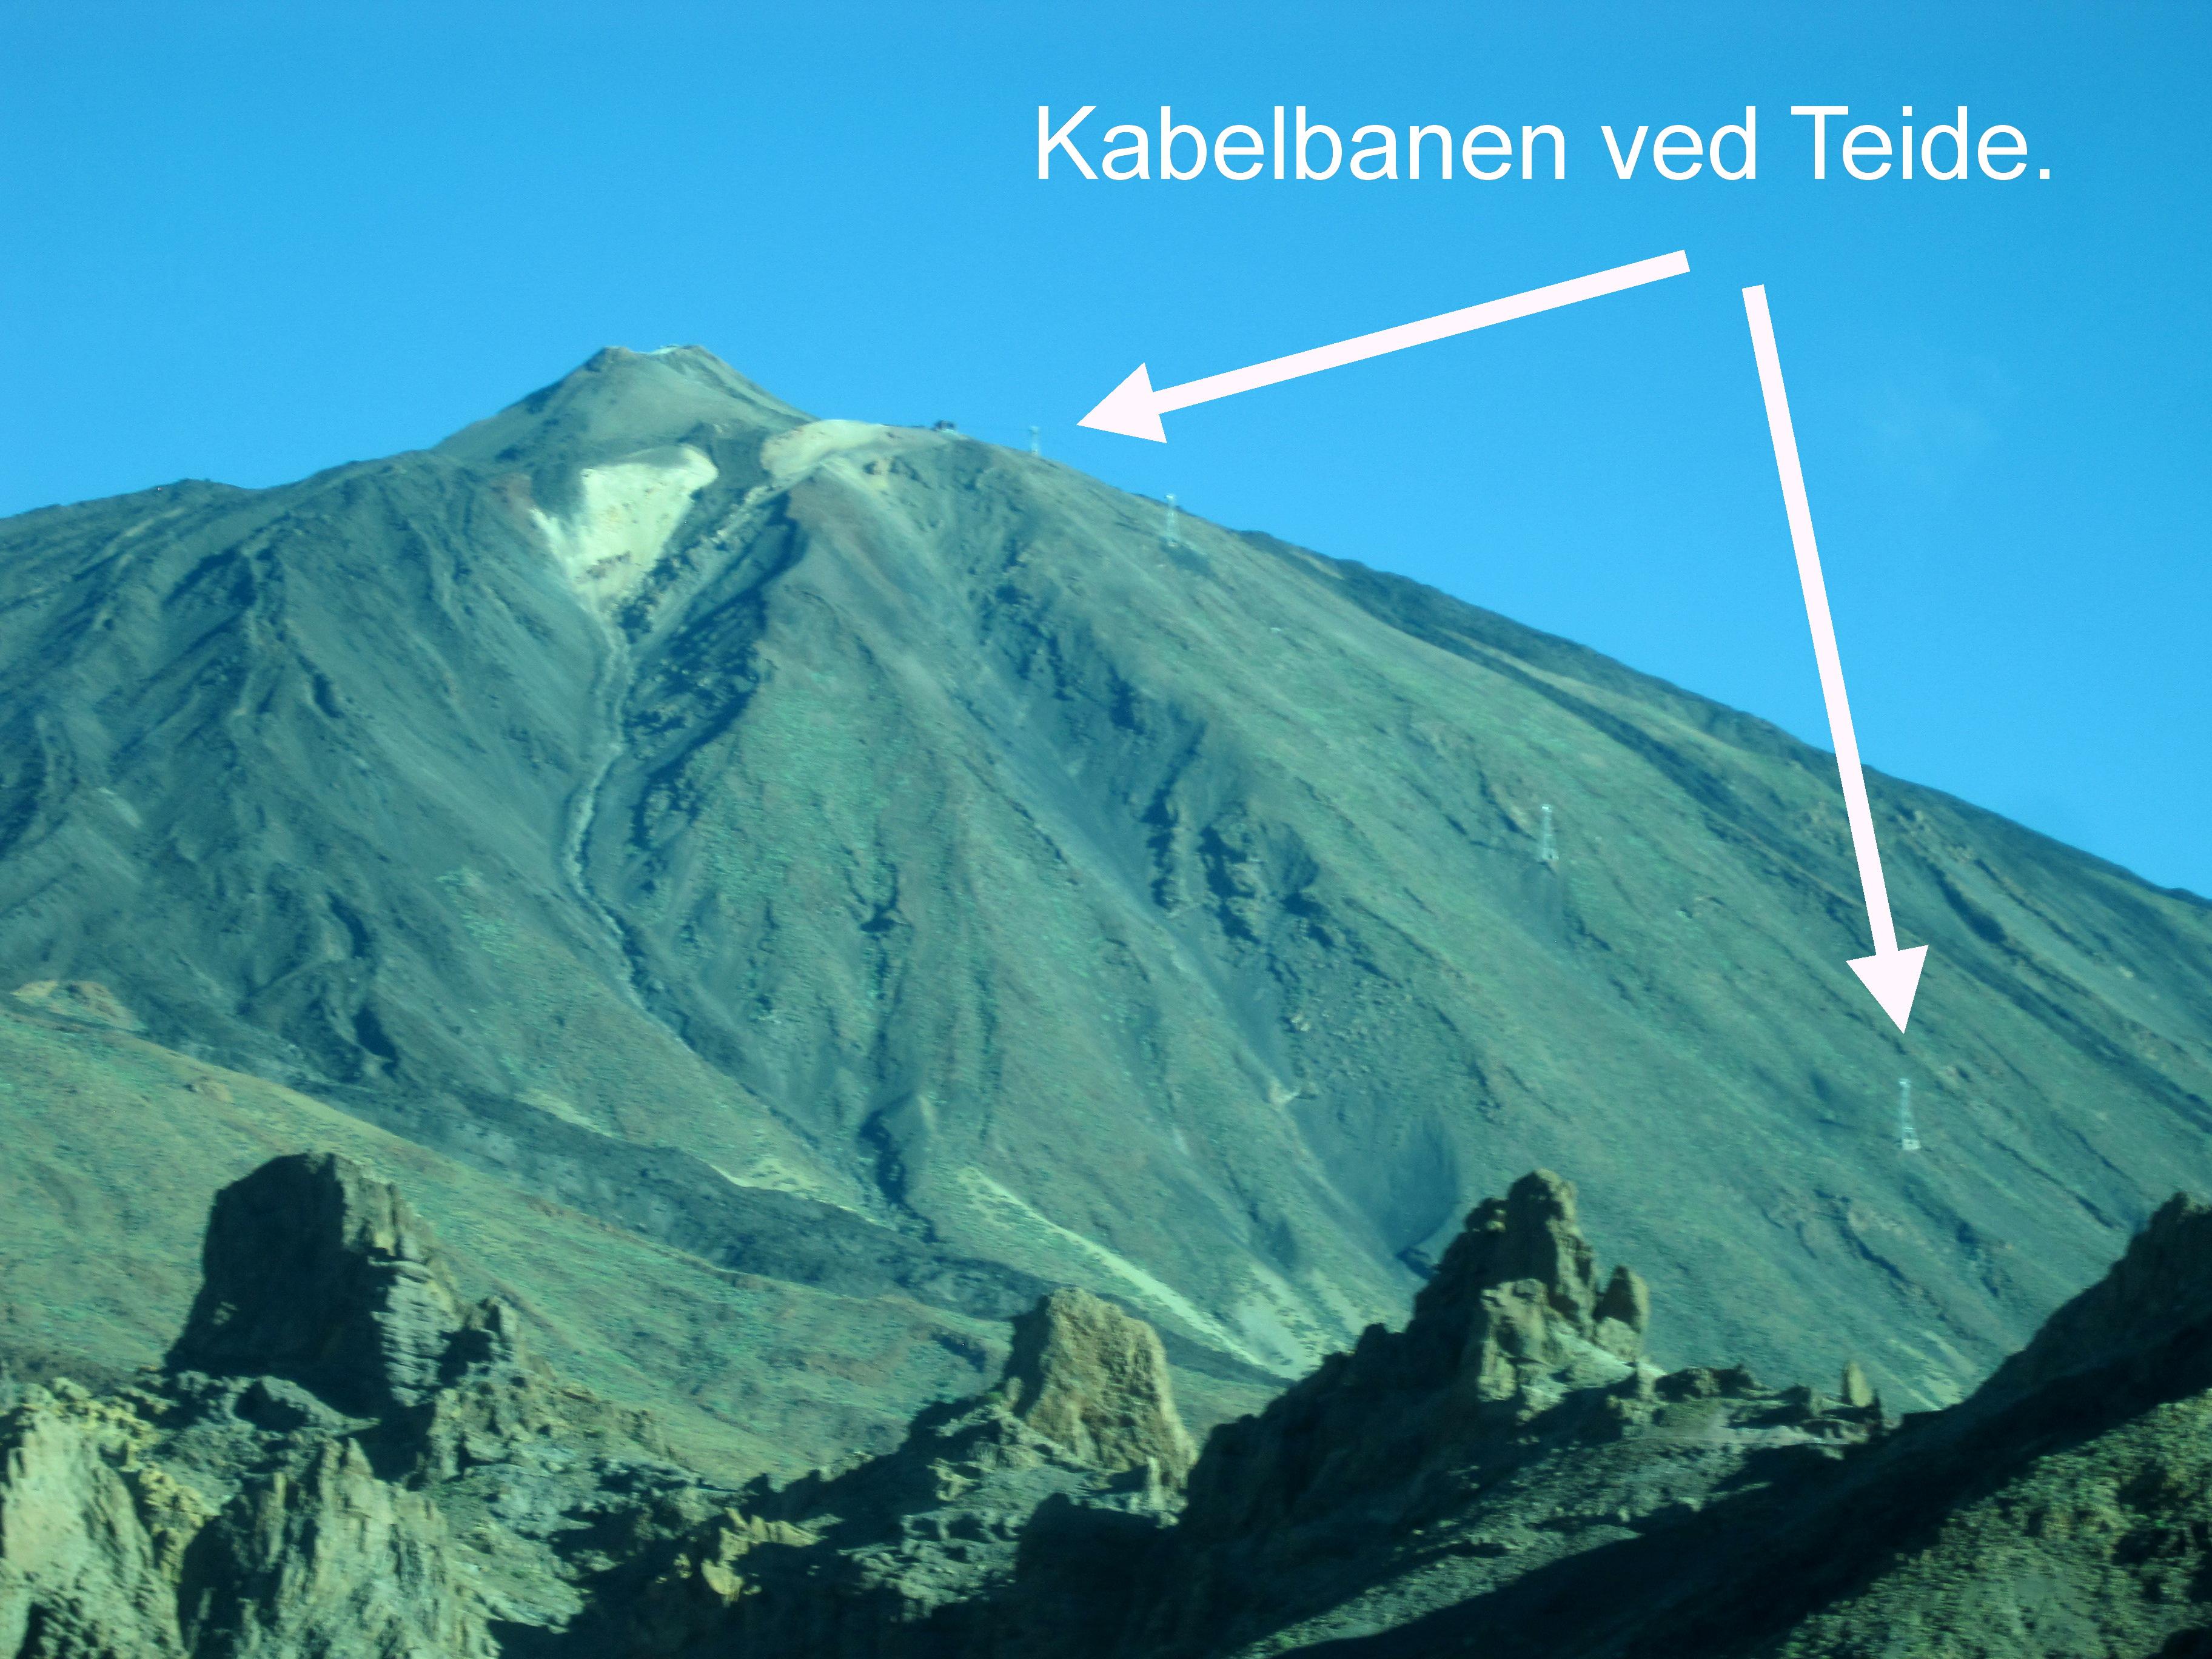 Kabelbanen ved Teide